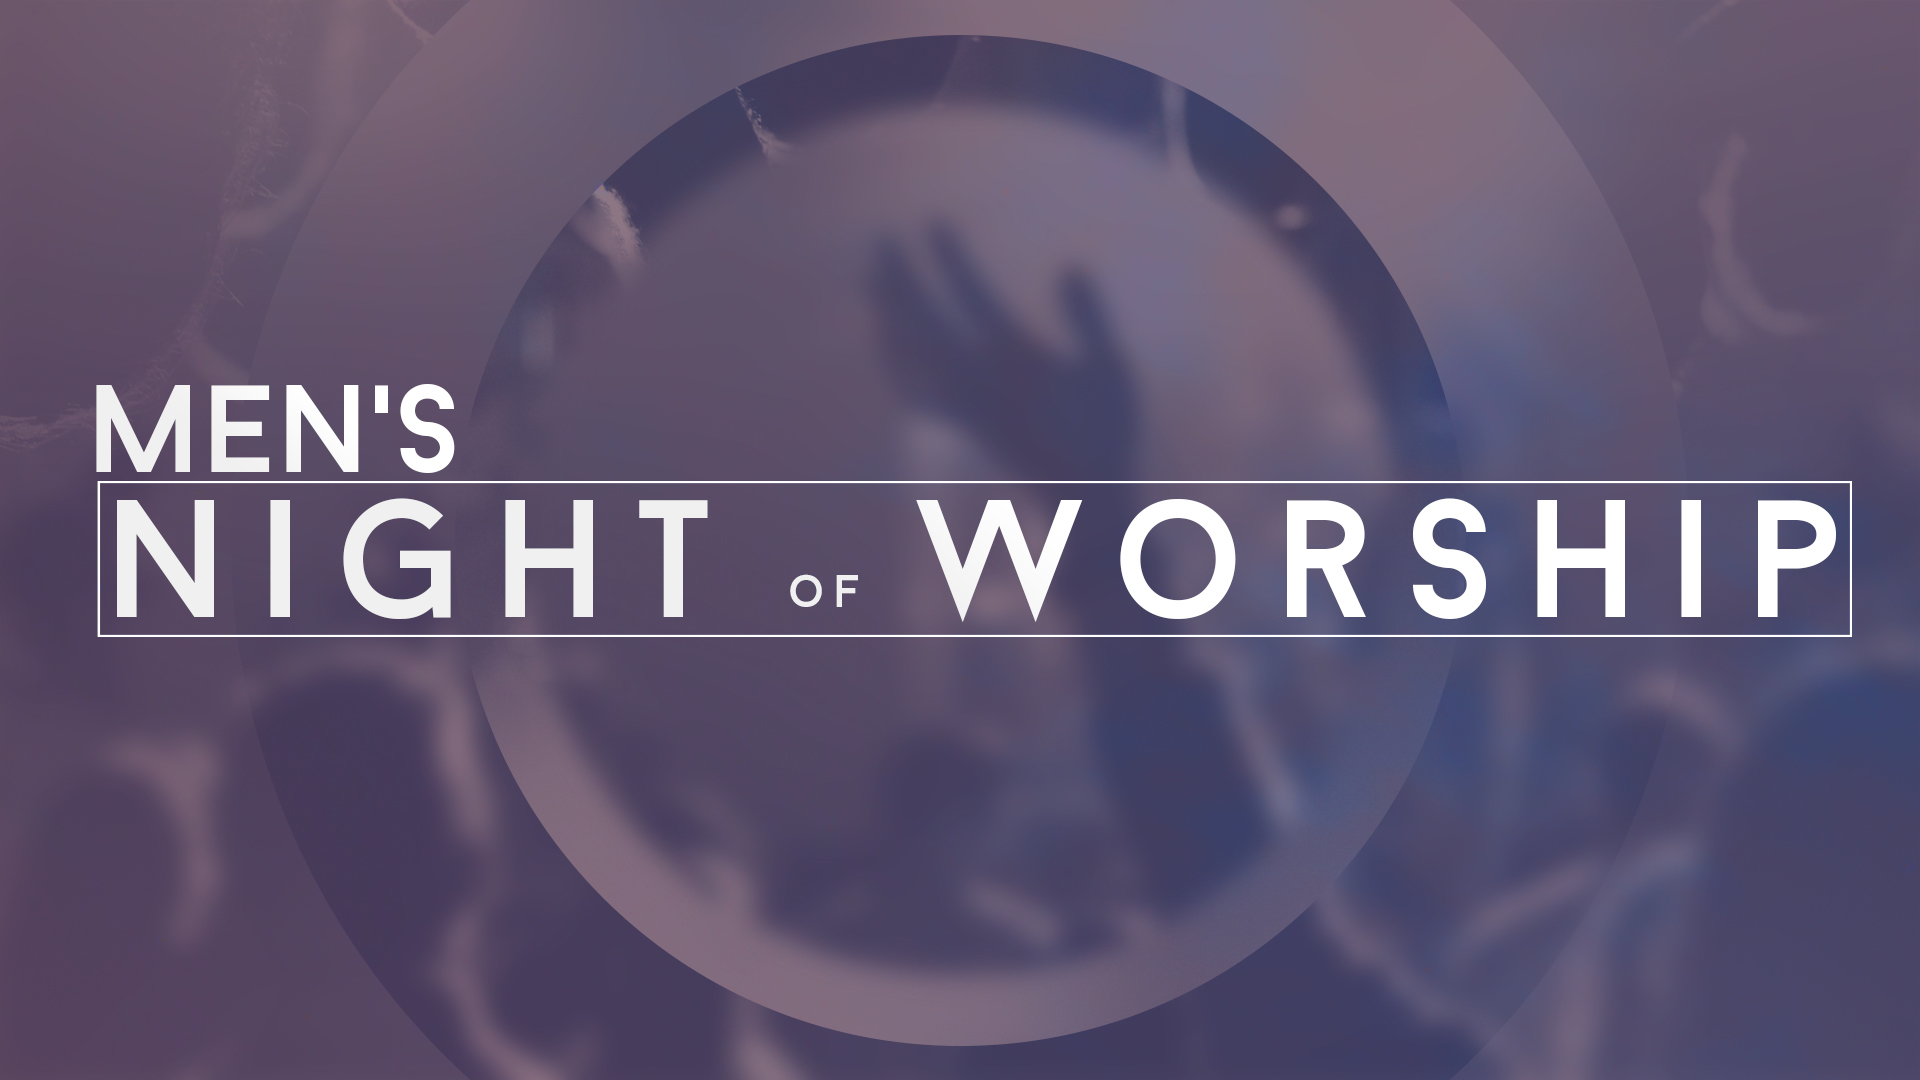 MENS Night of Worship.jpg